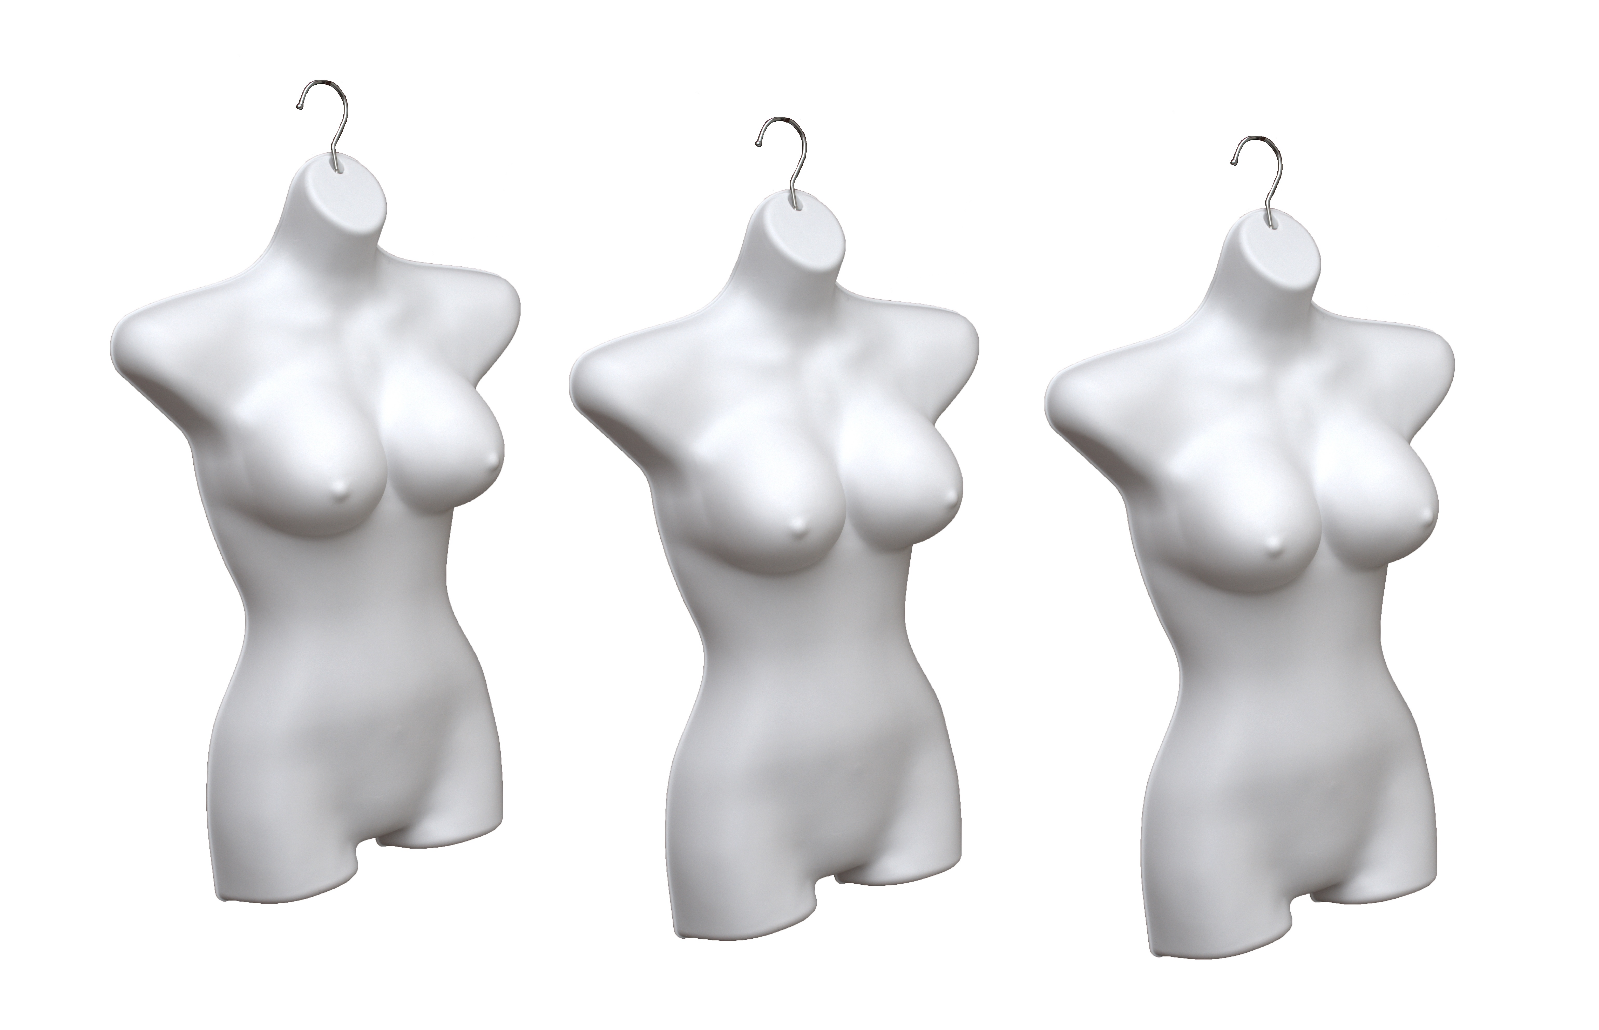 Women wearing girdles having sex